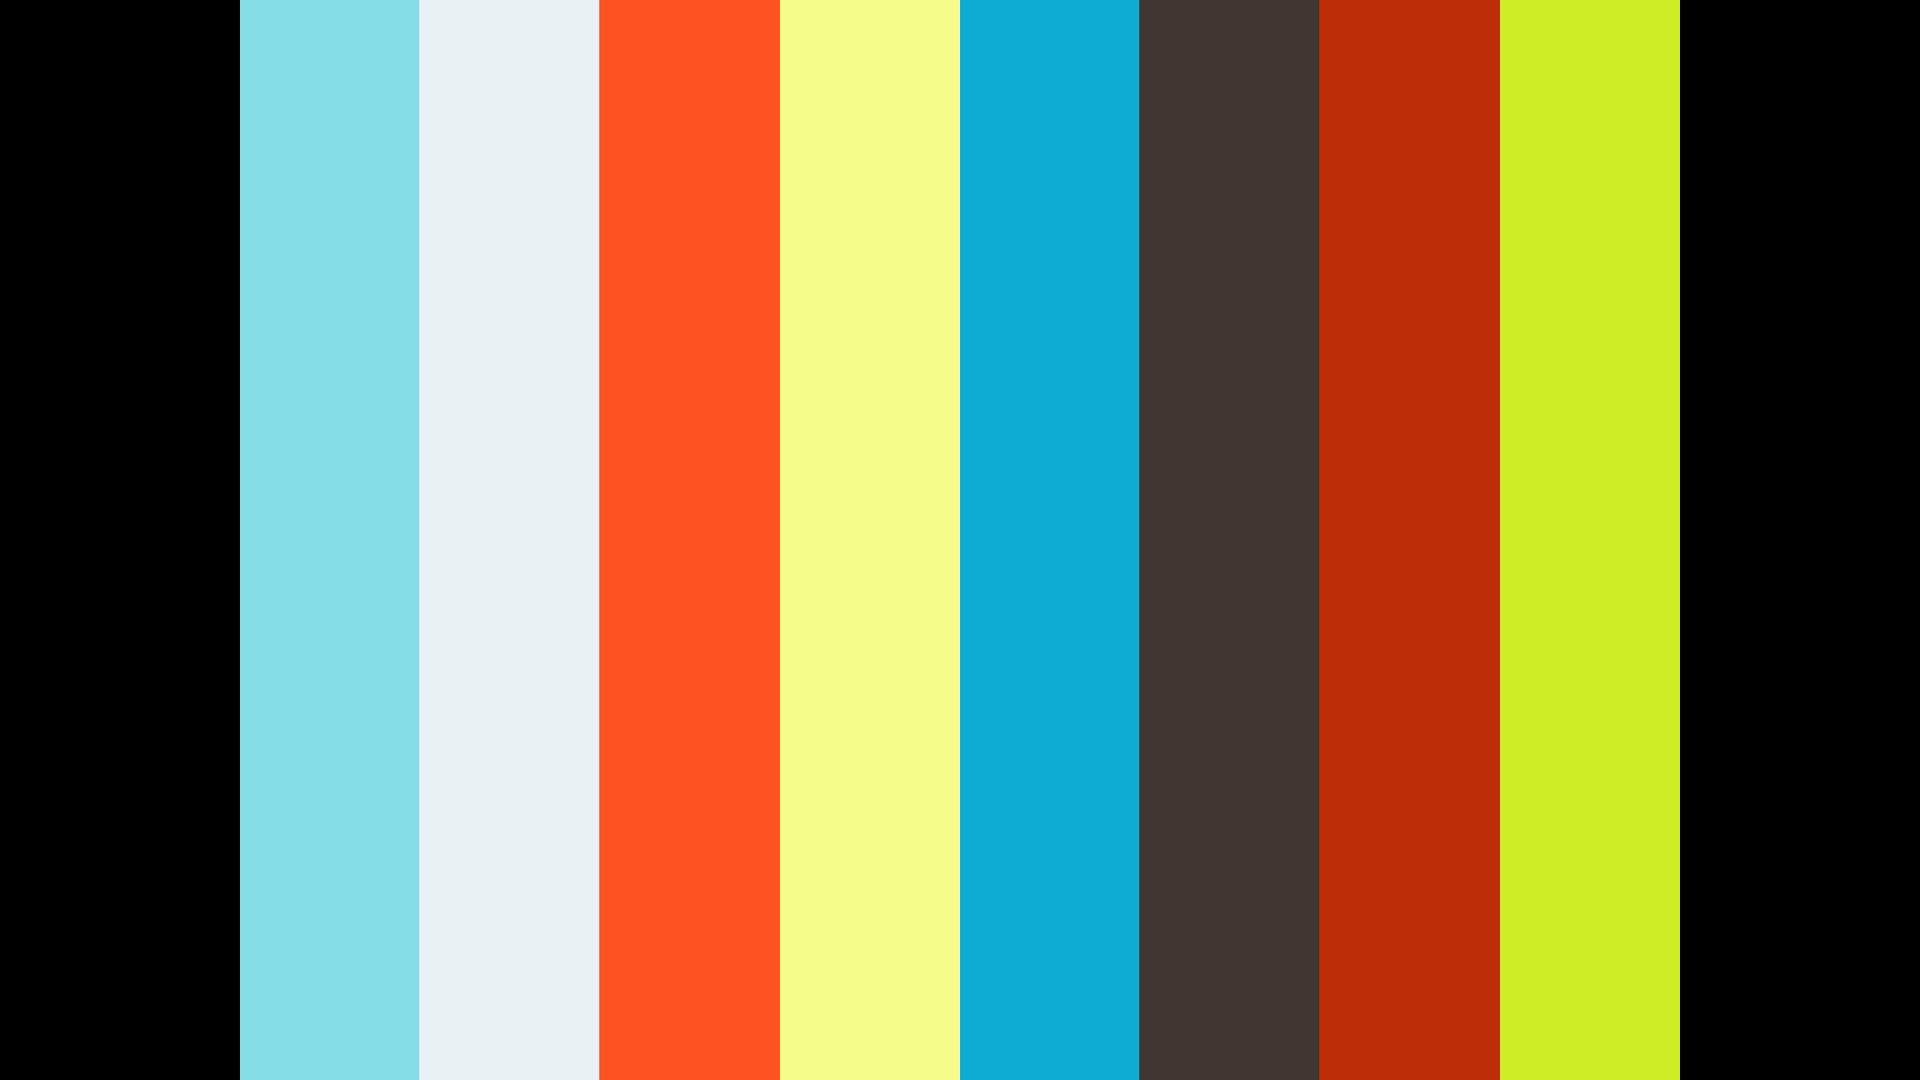 6.1 Creating Symbols - The component box